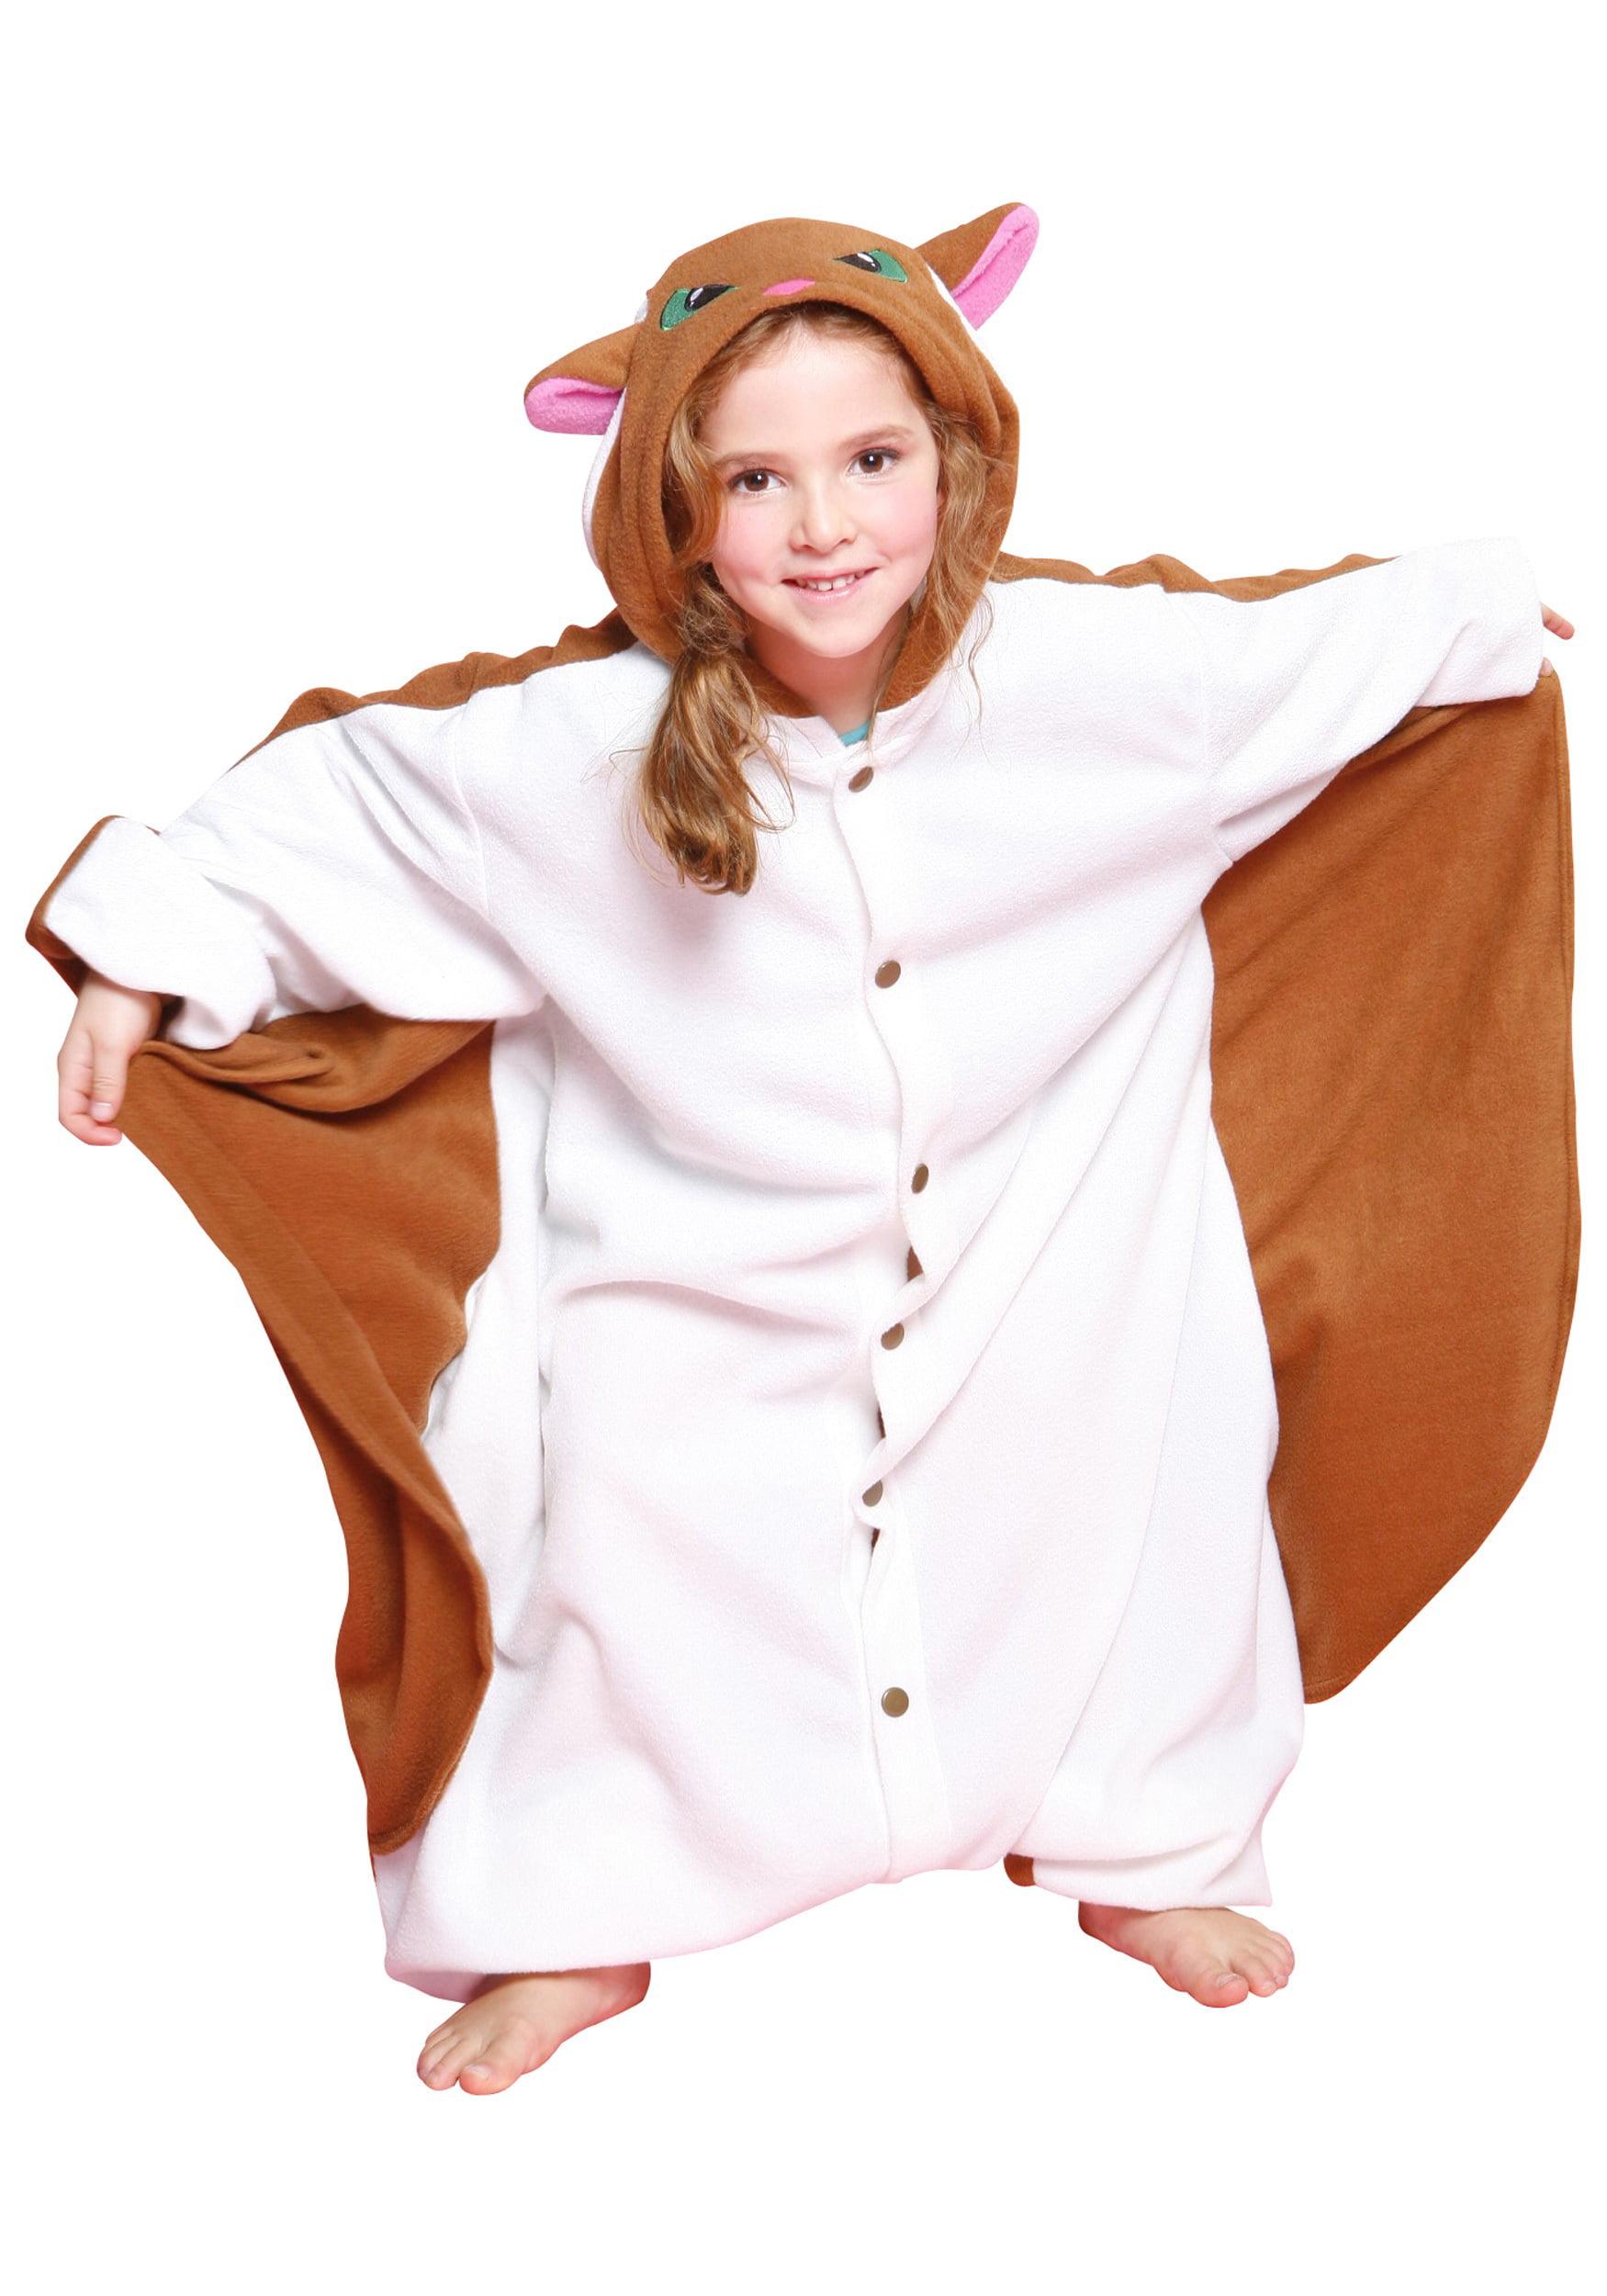 sc 1 st  Walmart & Kids Flying Squirrel Pajama Costume - Walmart.com